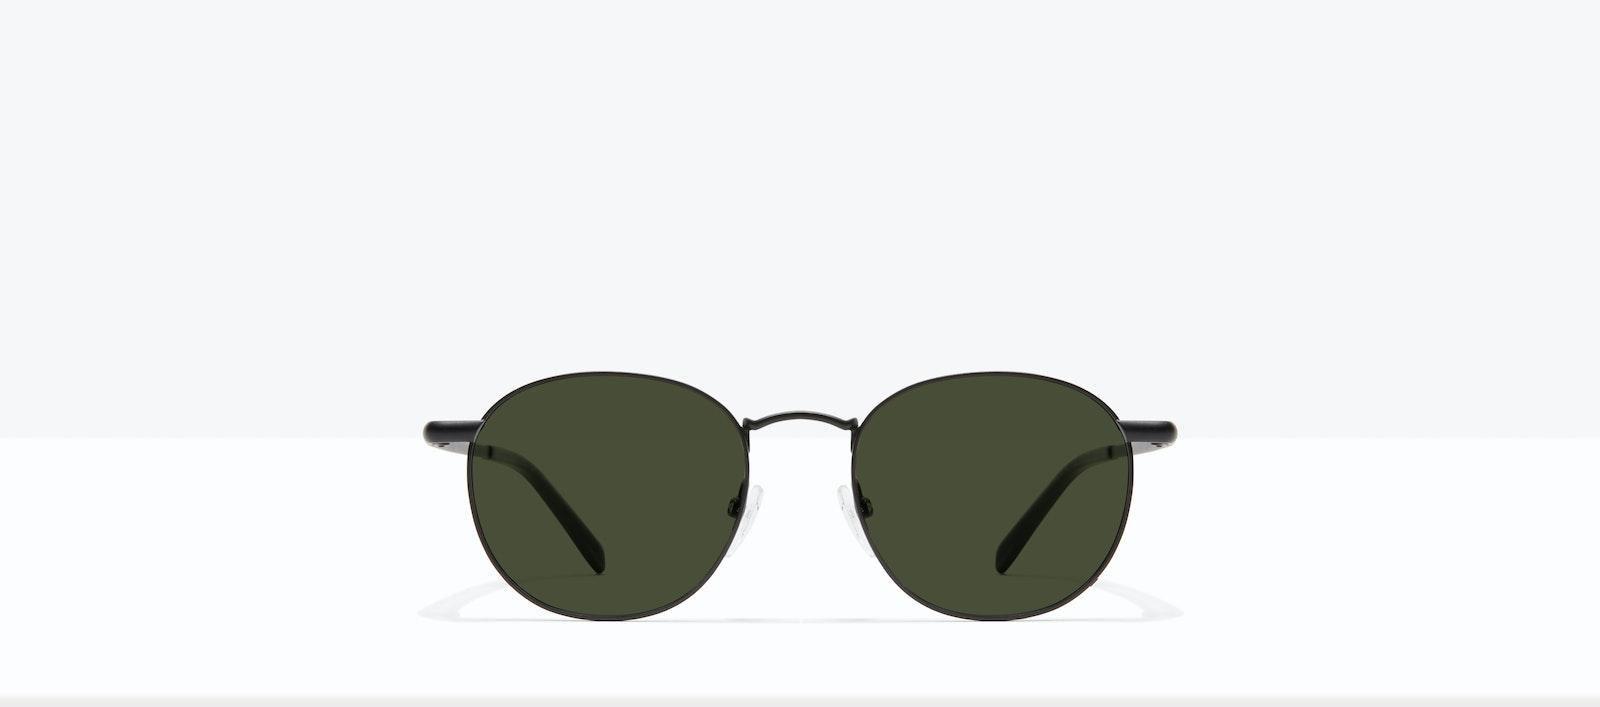 Affordable Fashion Glasses Round Sunglasses Men Women Divine Matte Black Front